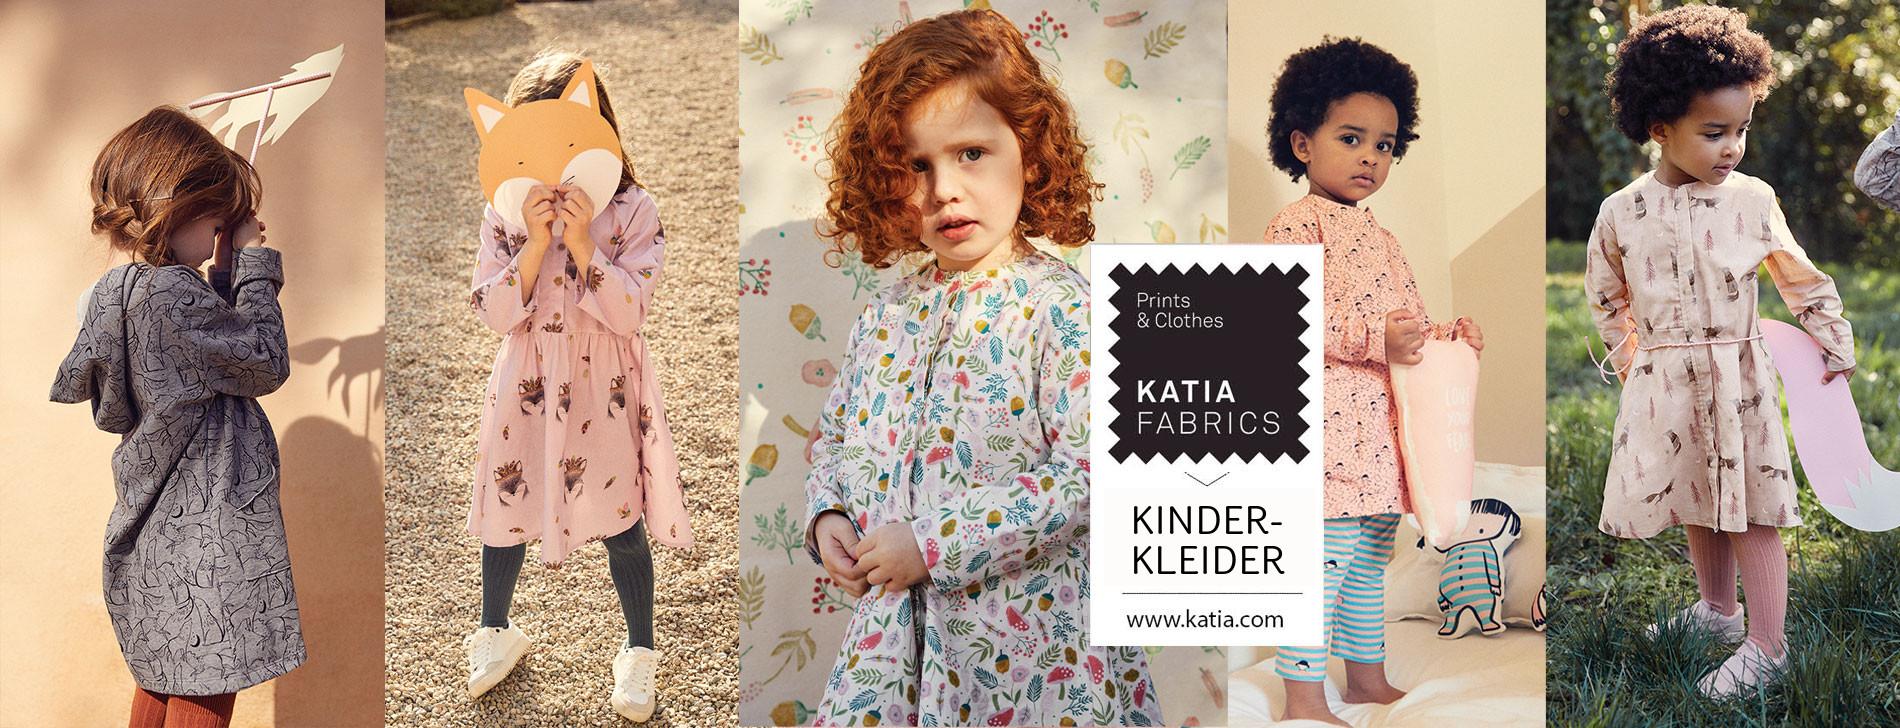 Kinderkleider-Mädchen-Schnittmuster